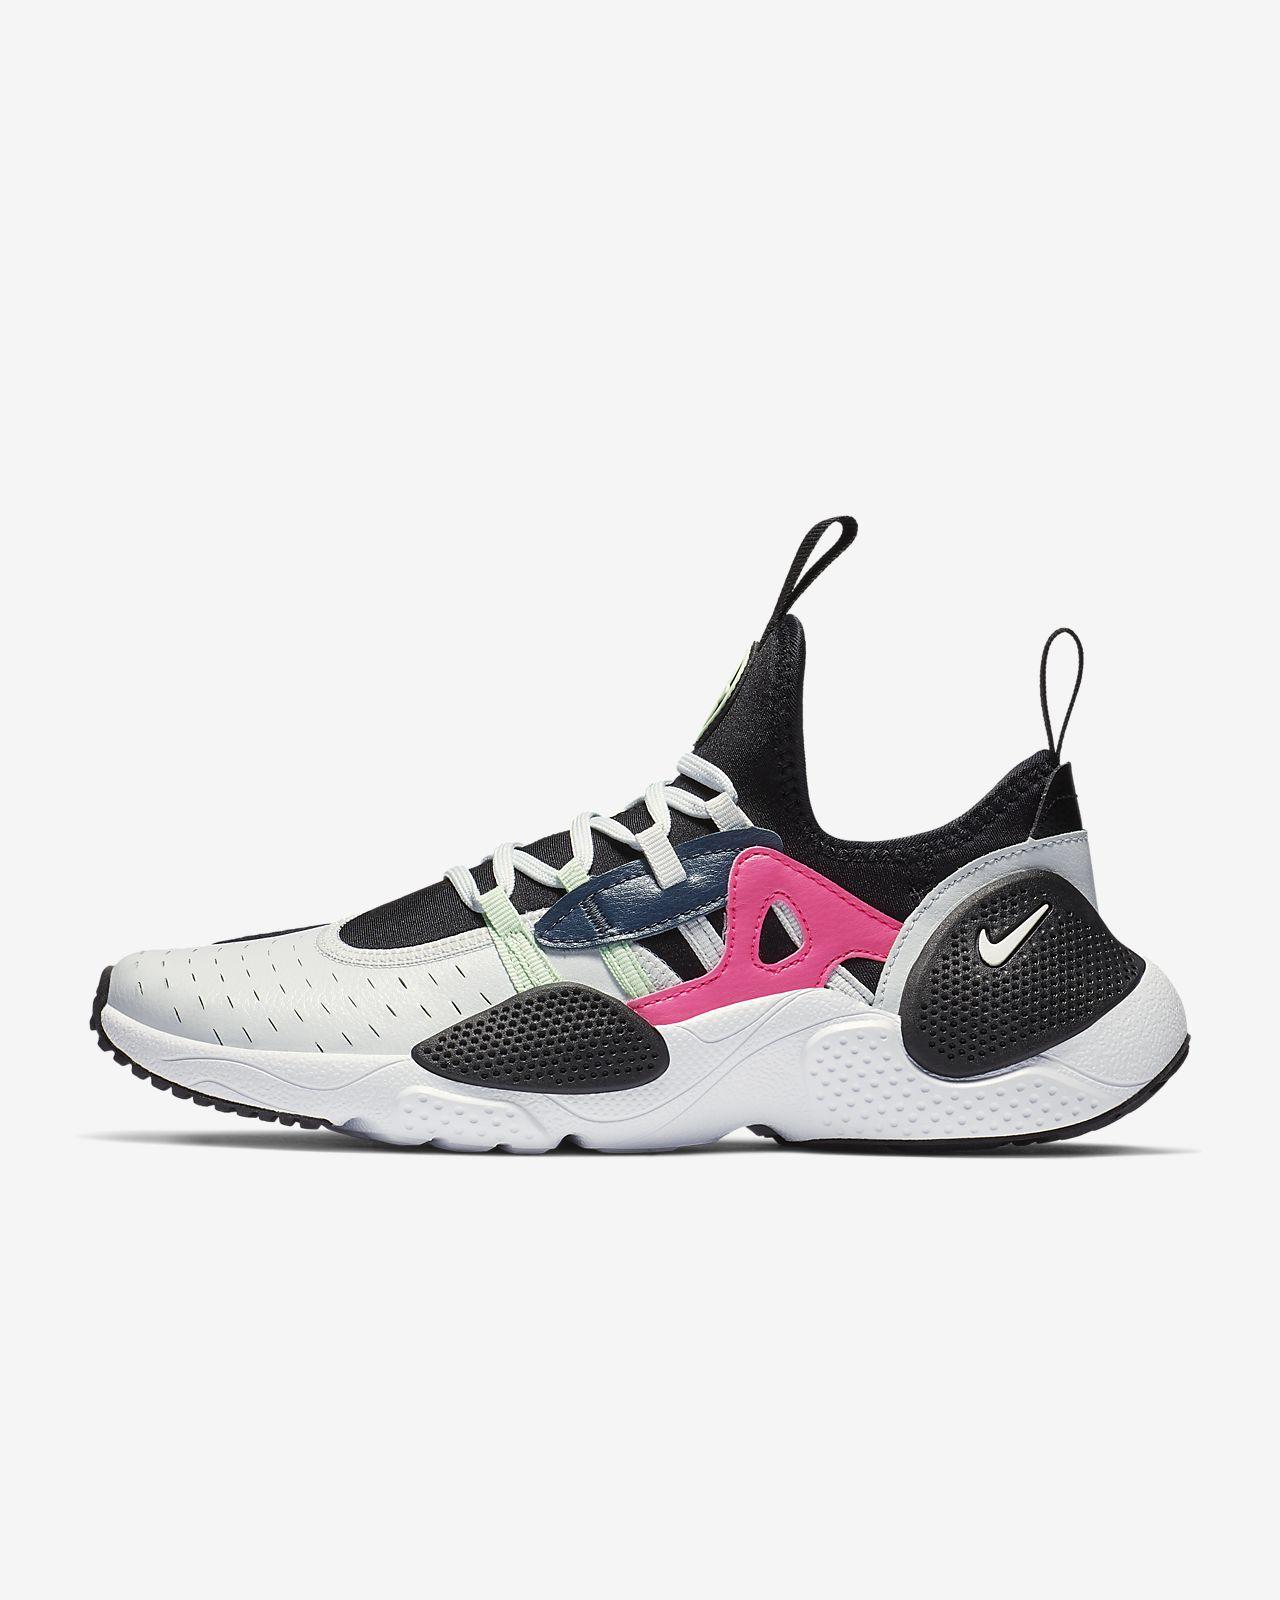 online store 8ae88 b7de2 Big Kids  Shoe. Nike Huarache E.D.G.E